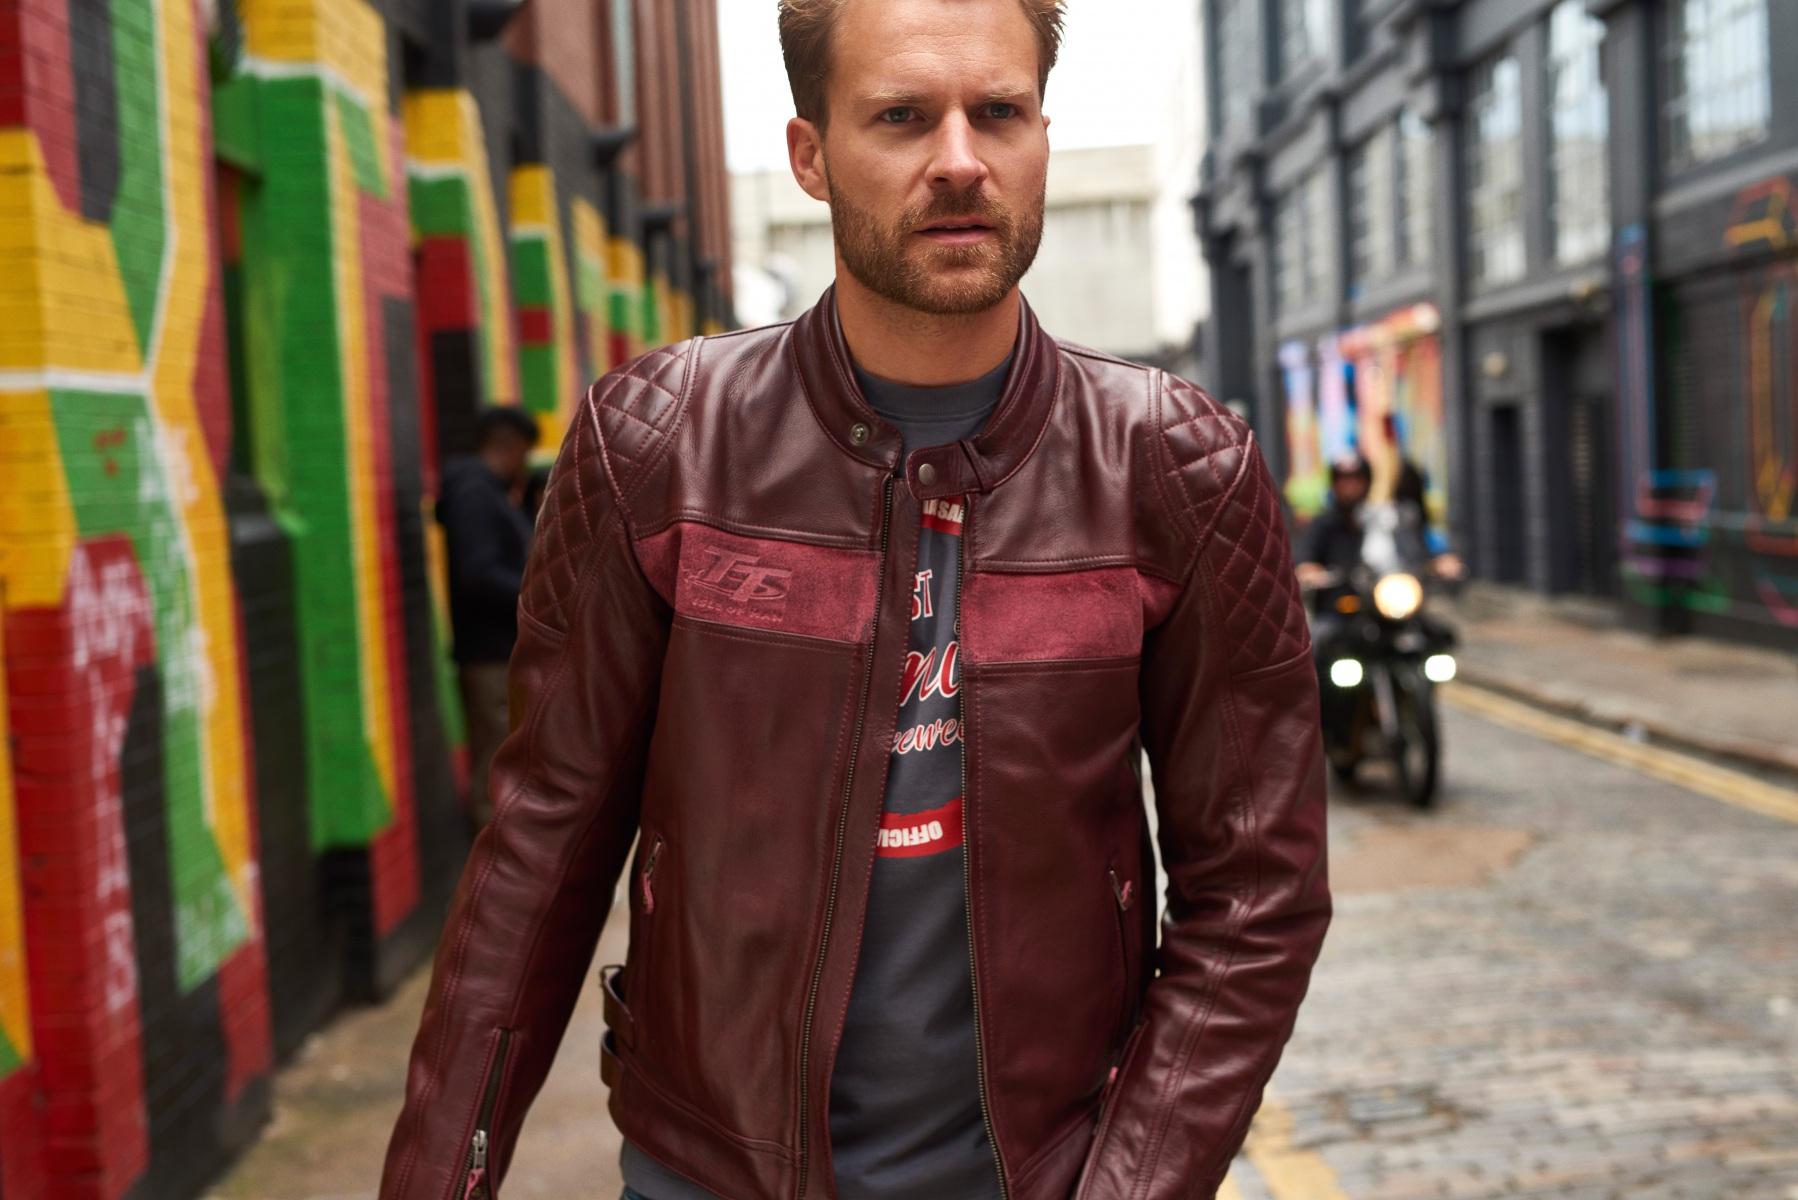 102375-rst-iom-tt-brandish-leather-jacket-oxblood-lifestyle-01